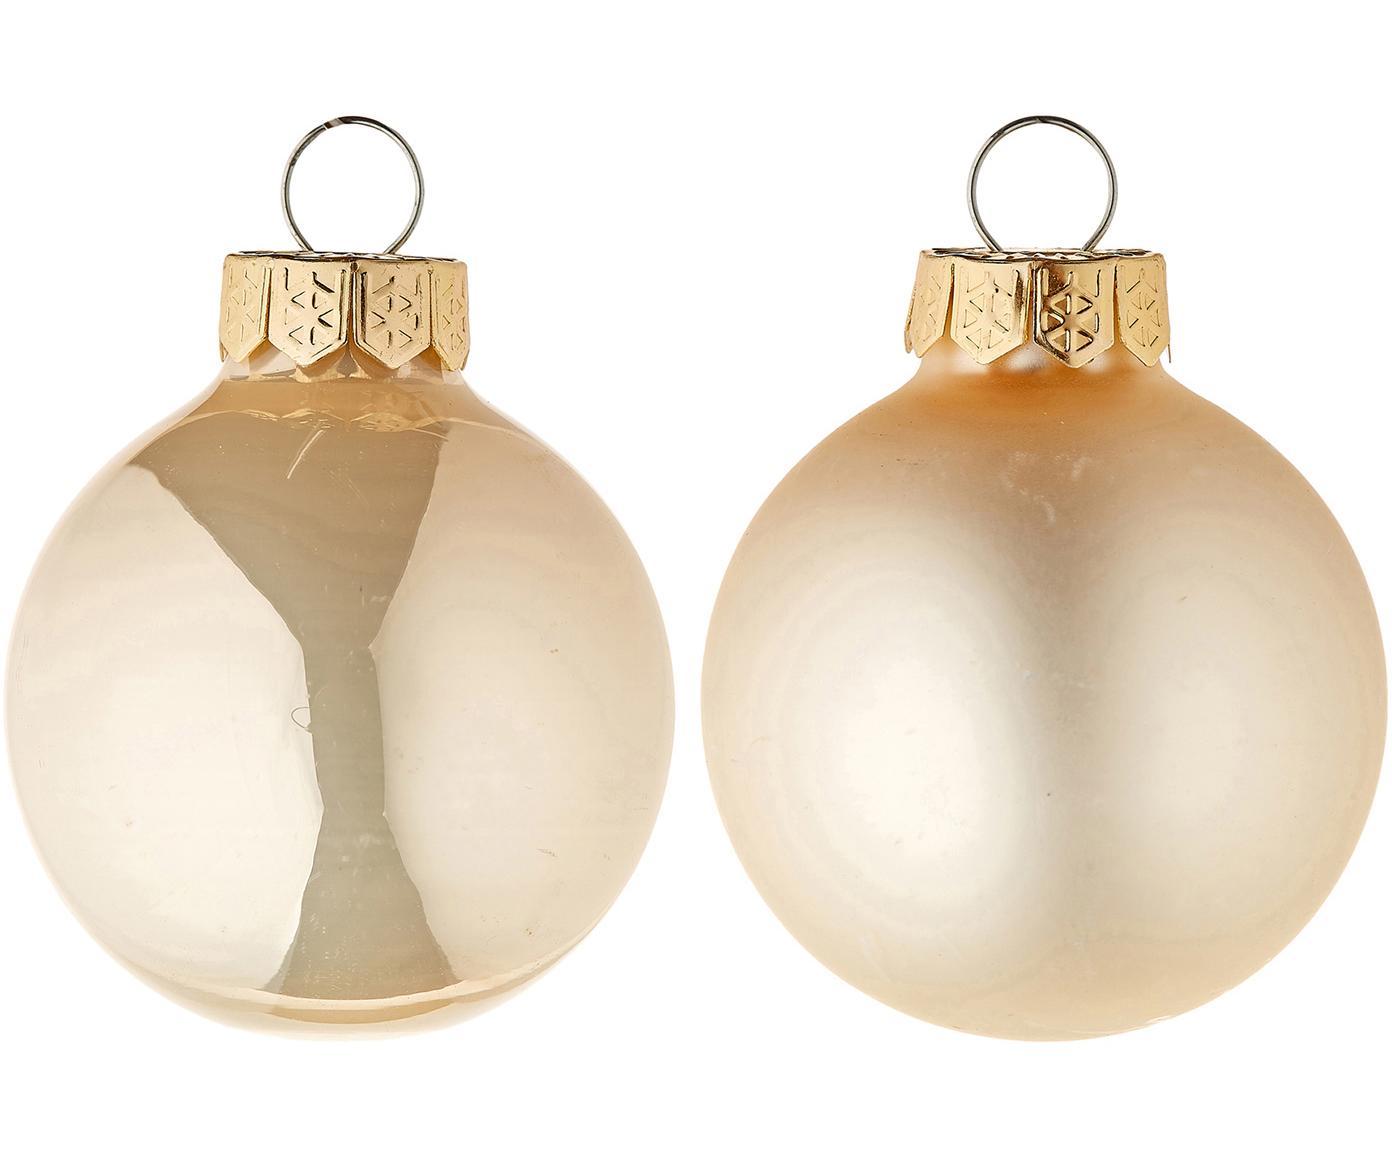 Mini-kerstballenset Evergreen, 16-delig, Crèmekleurig, Ø 4 cm